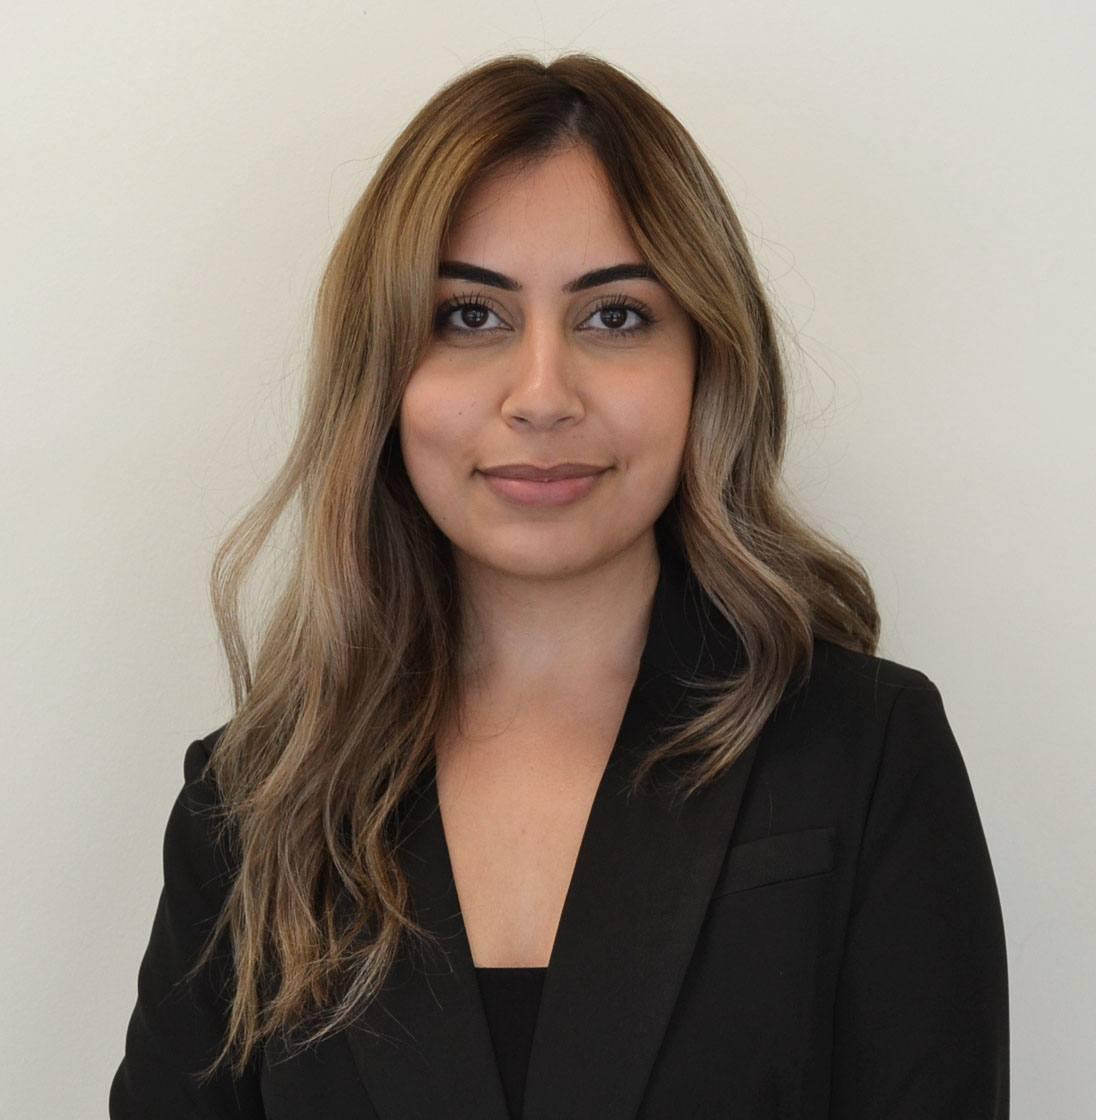 Mariam Ghowsi